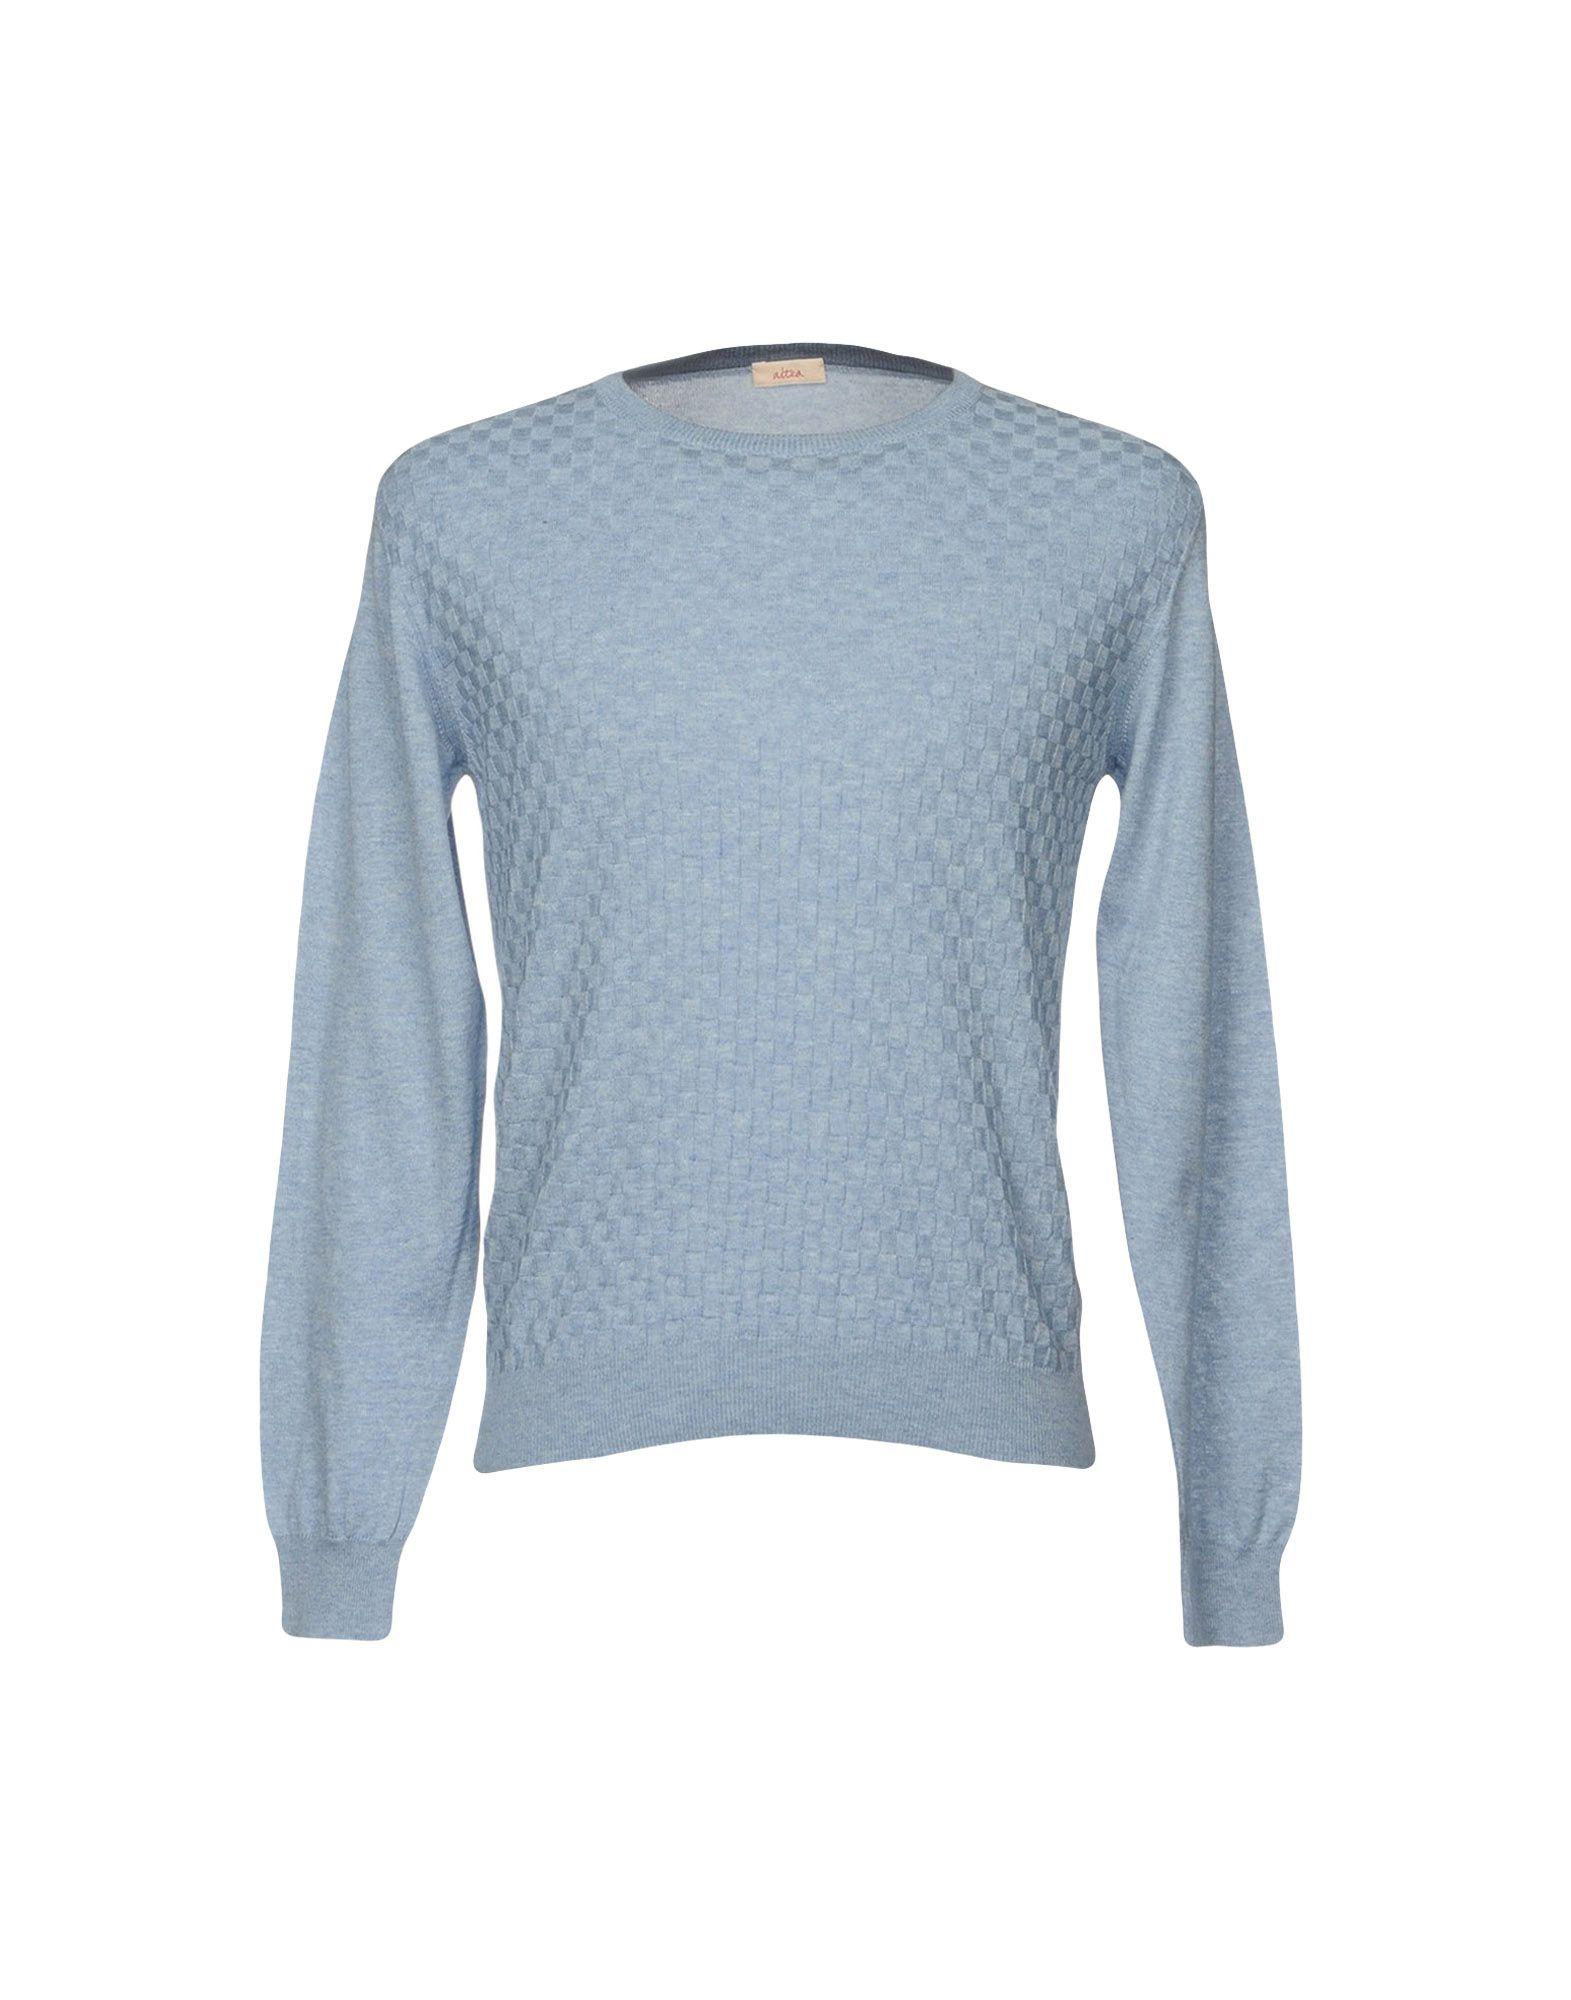 ALTEA dal 1973 Свитер altea dal 1973 джинсовая рубашка